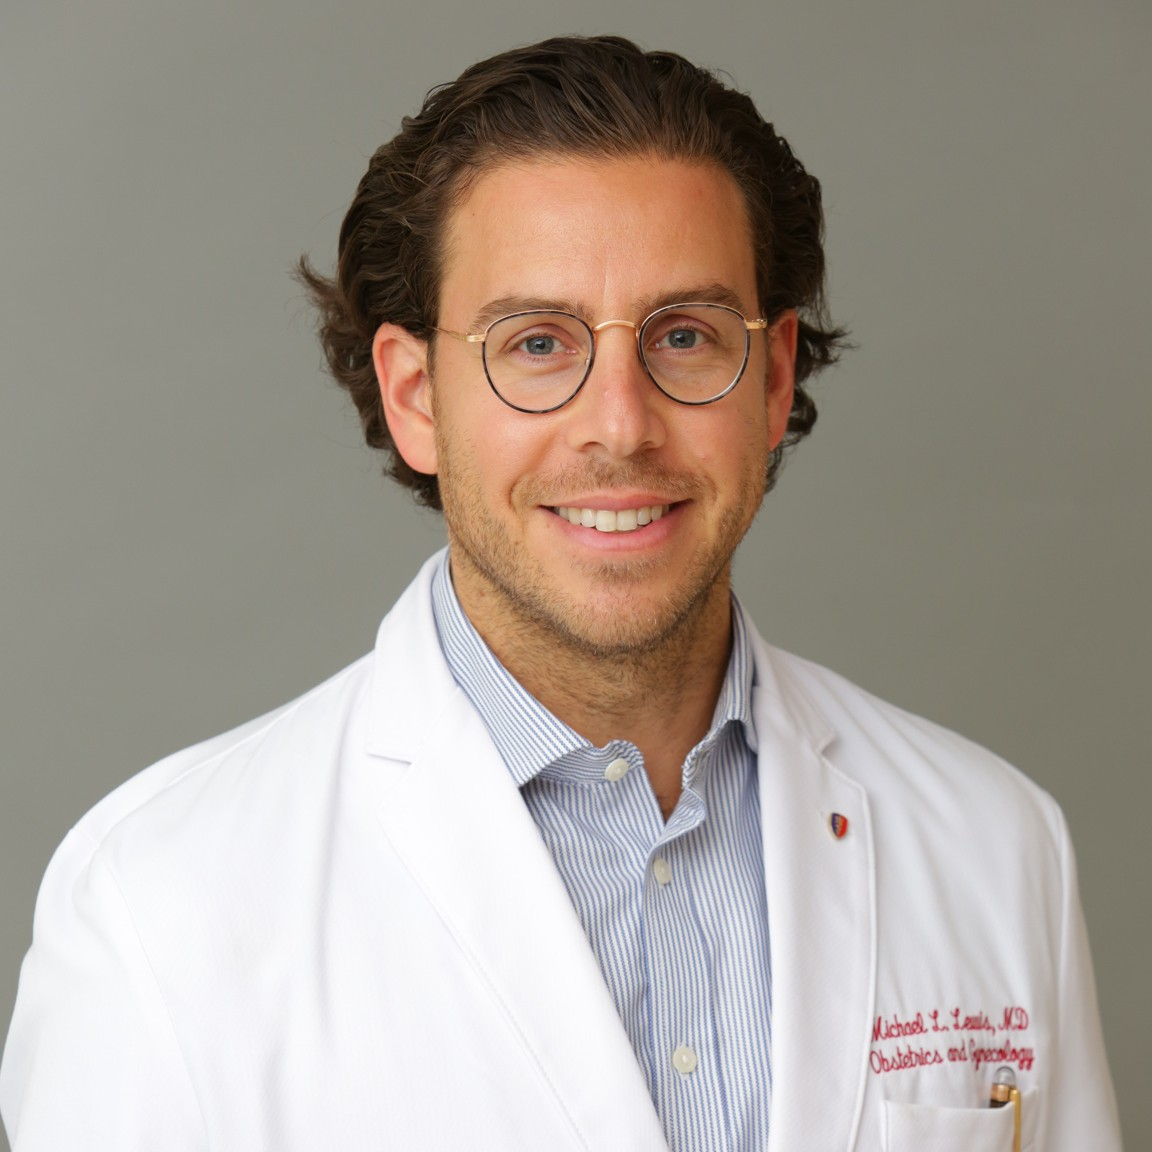 Image For Dr. Michael L Lewis MD